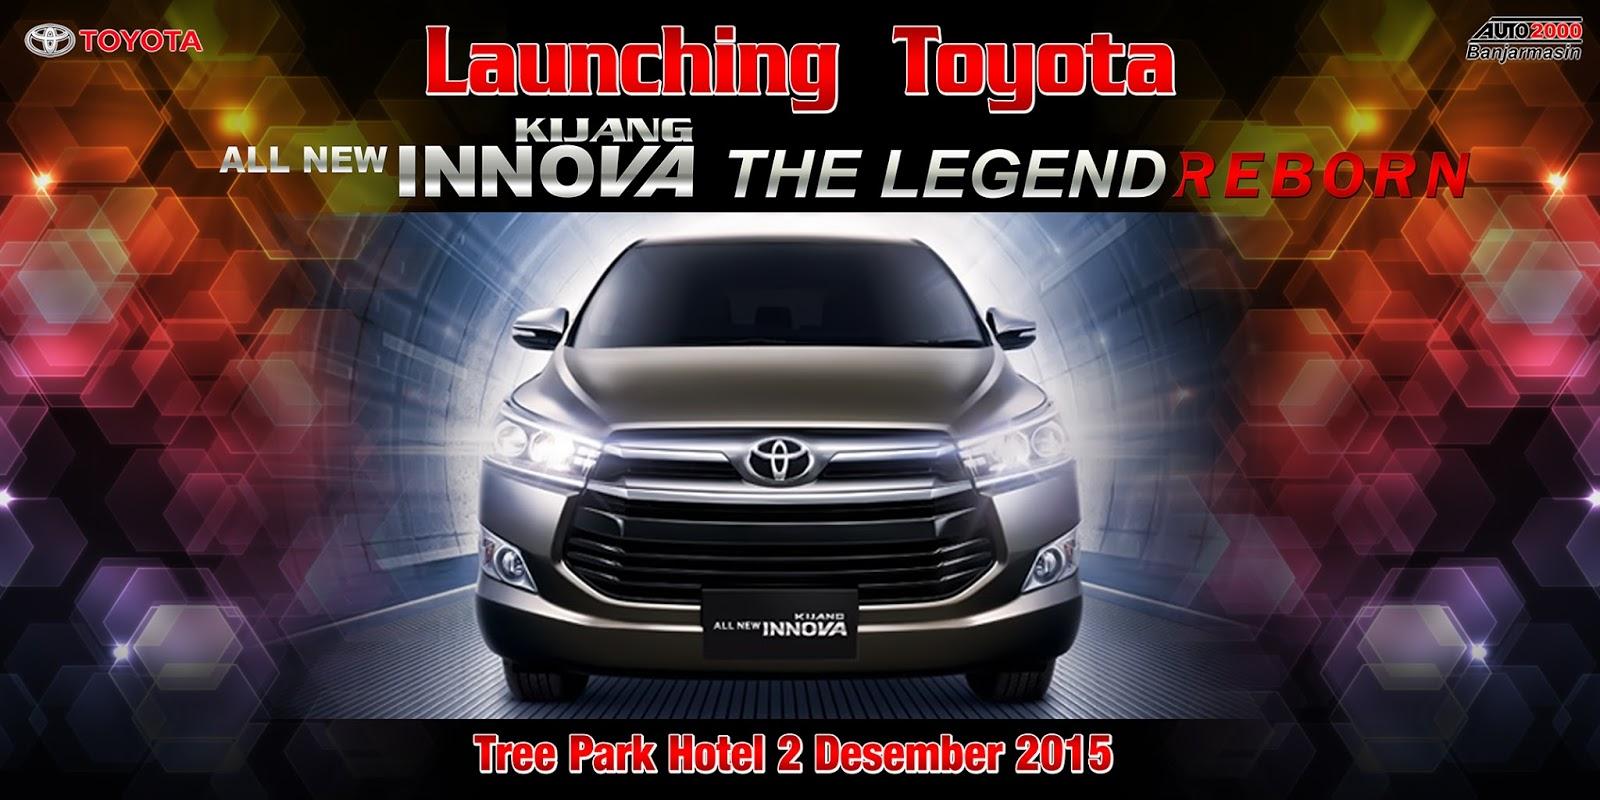 toyota auto2000 banjarmasin: launching all new kijang innova the